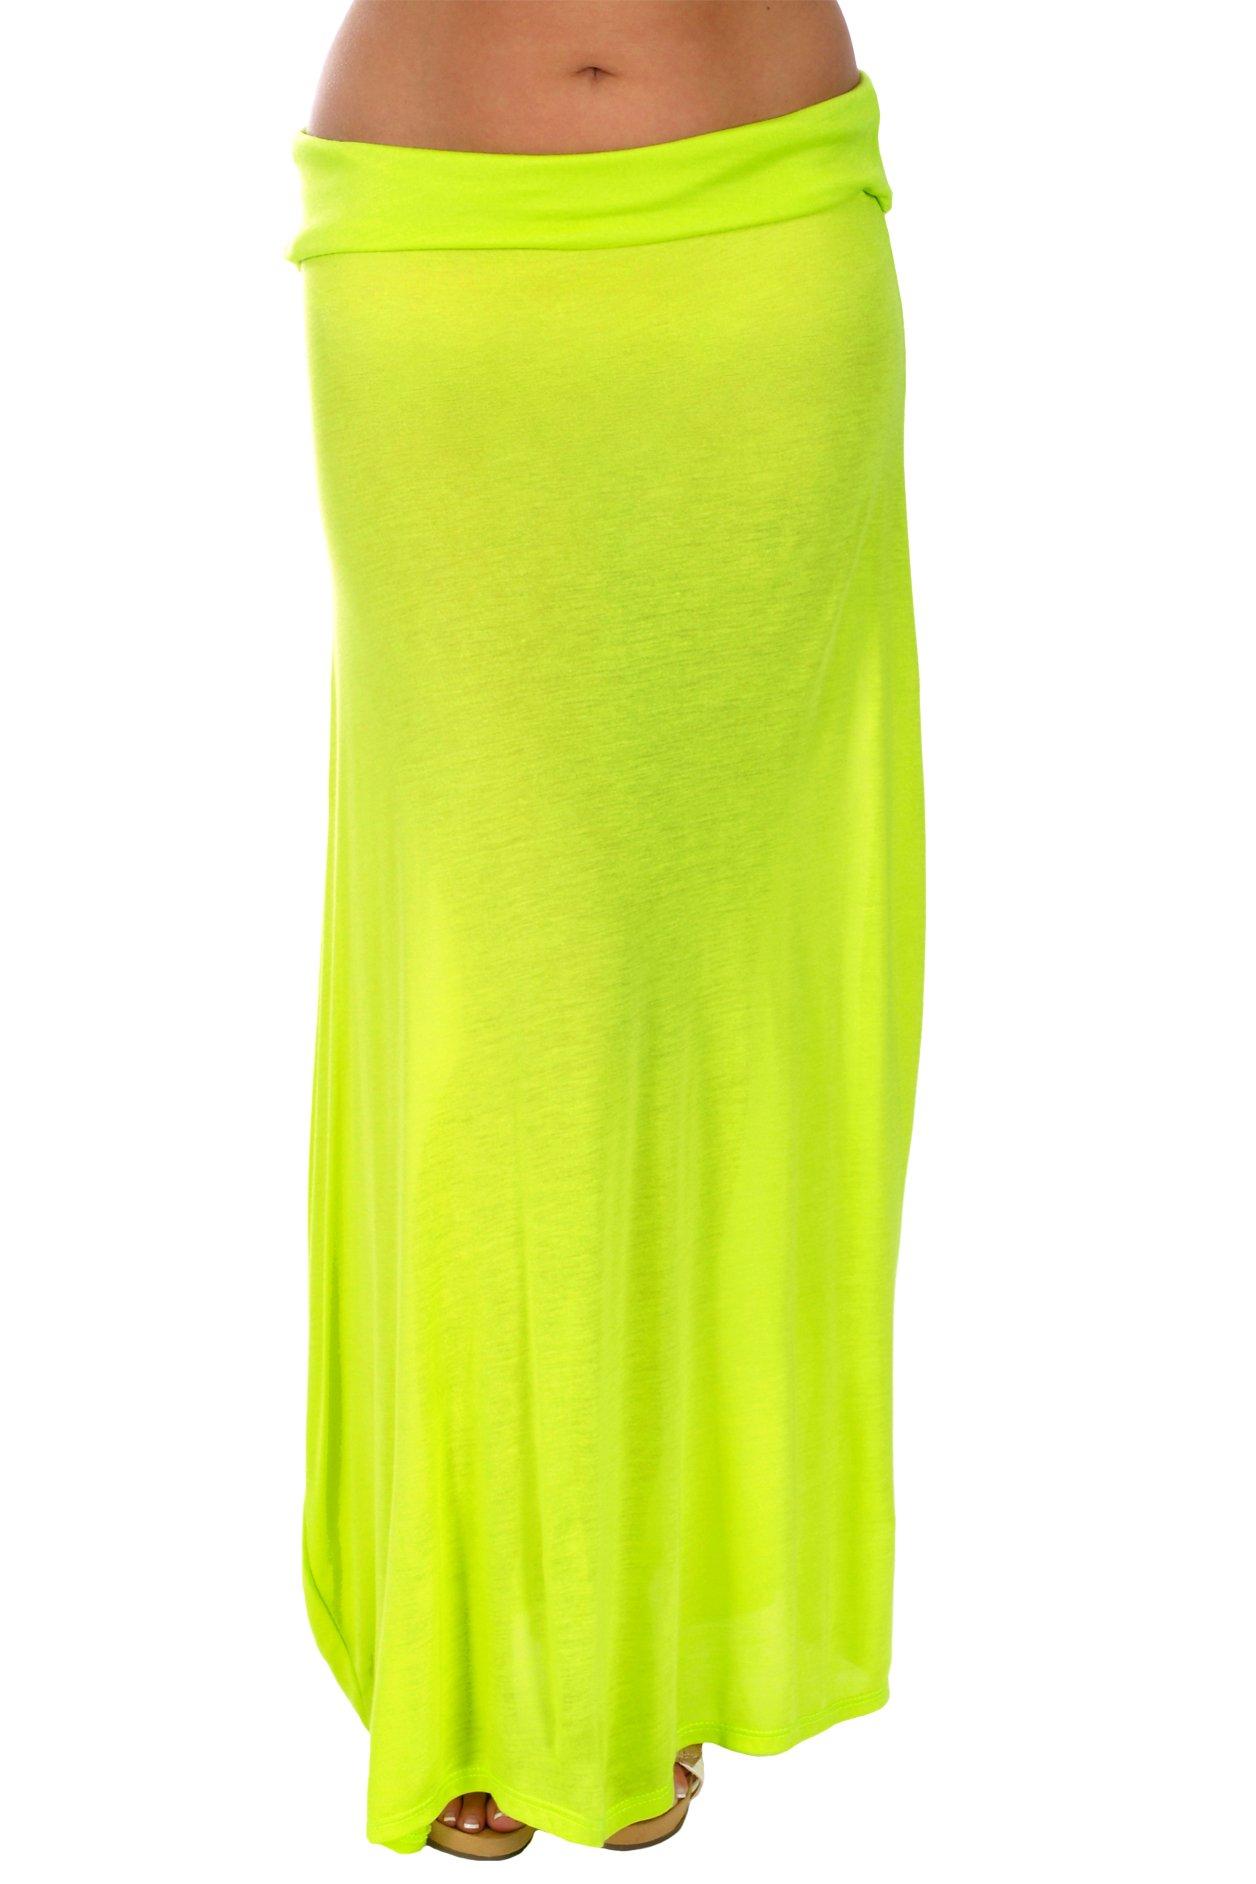 Gazooz Women's Semi-Sheer Maxi Skirt (Medium, Lime Green)